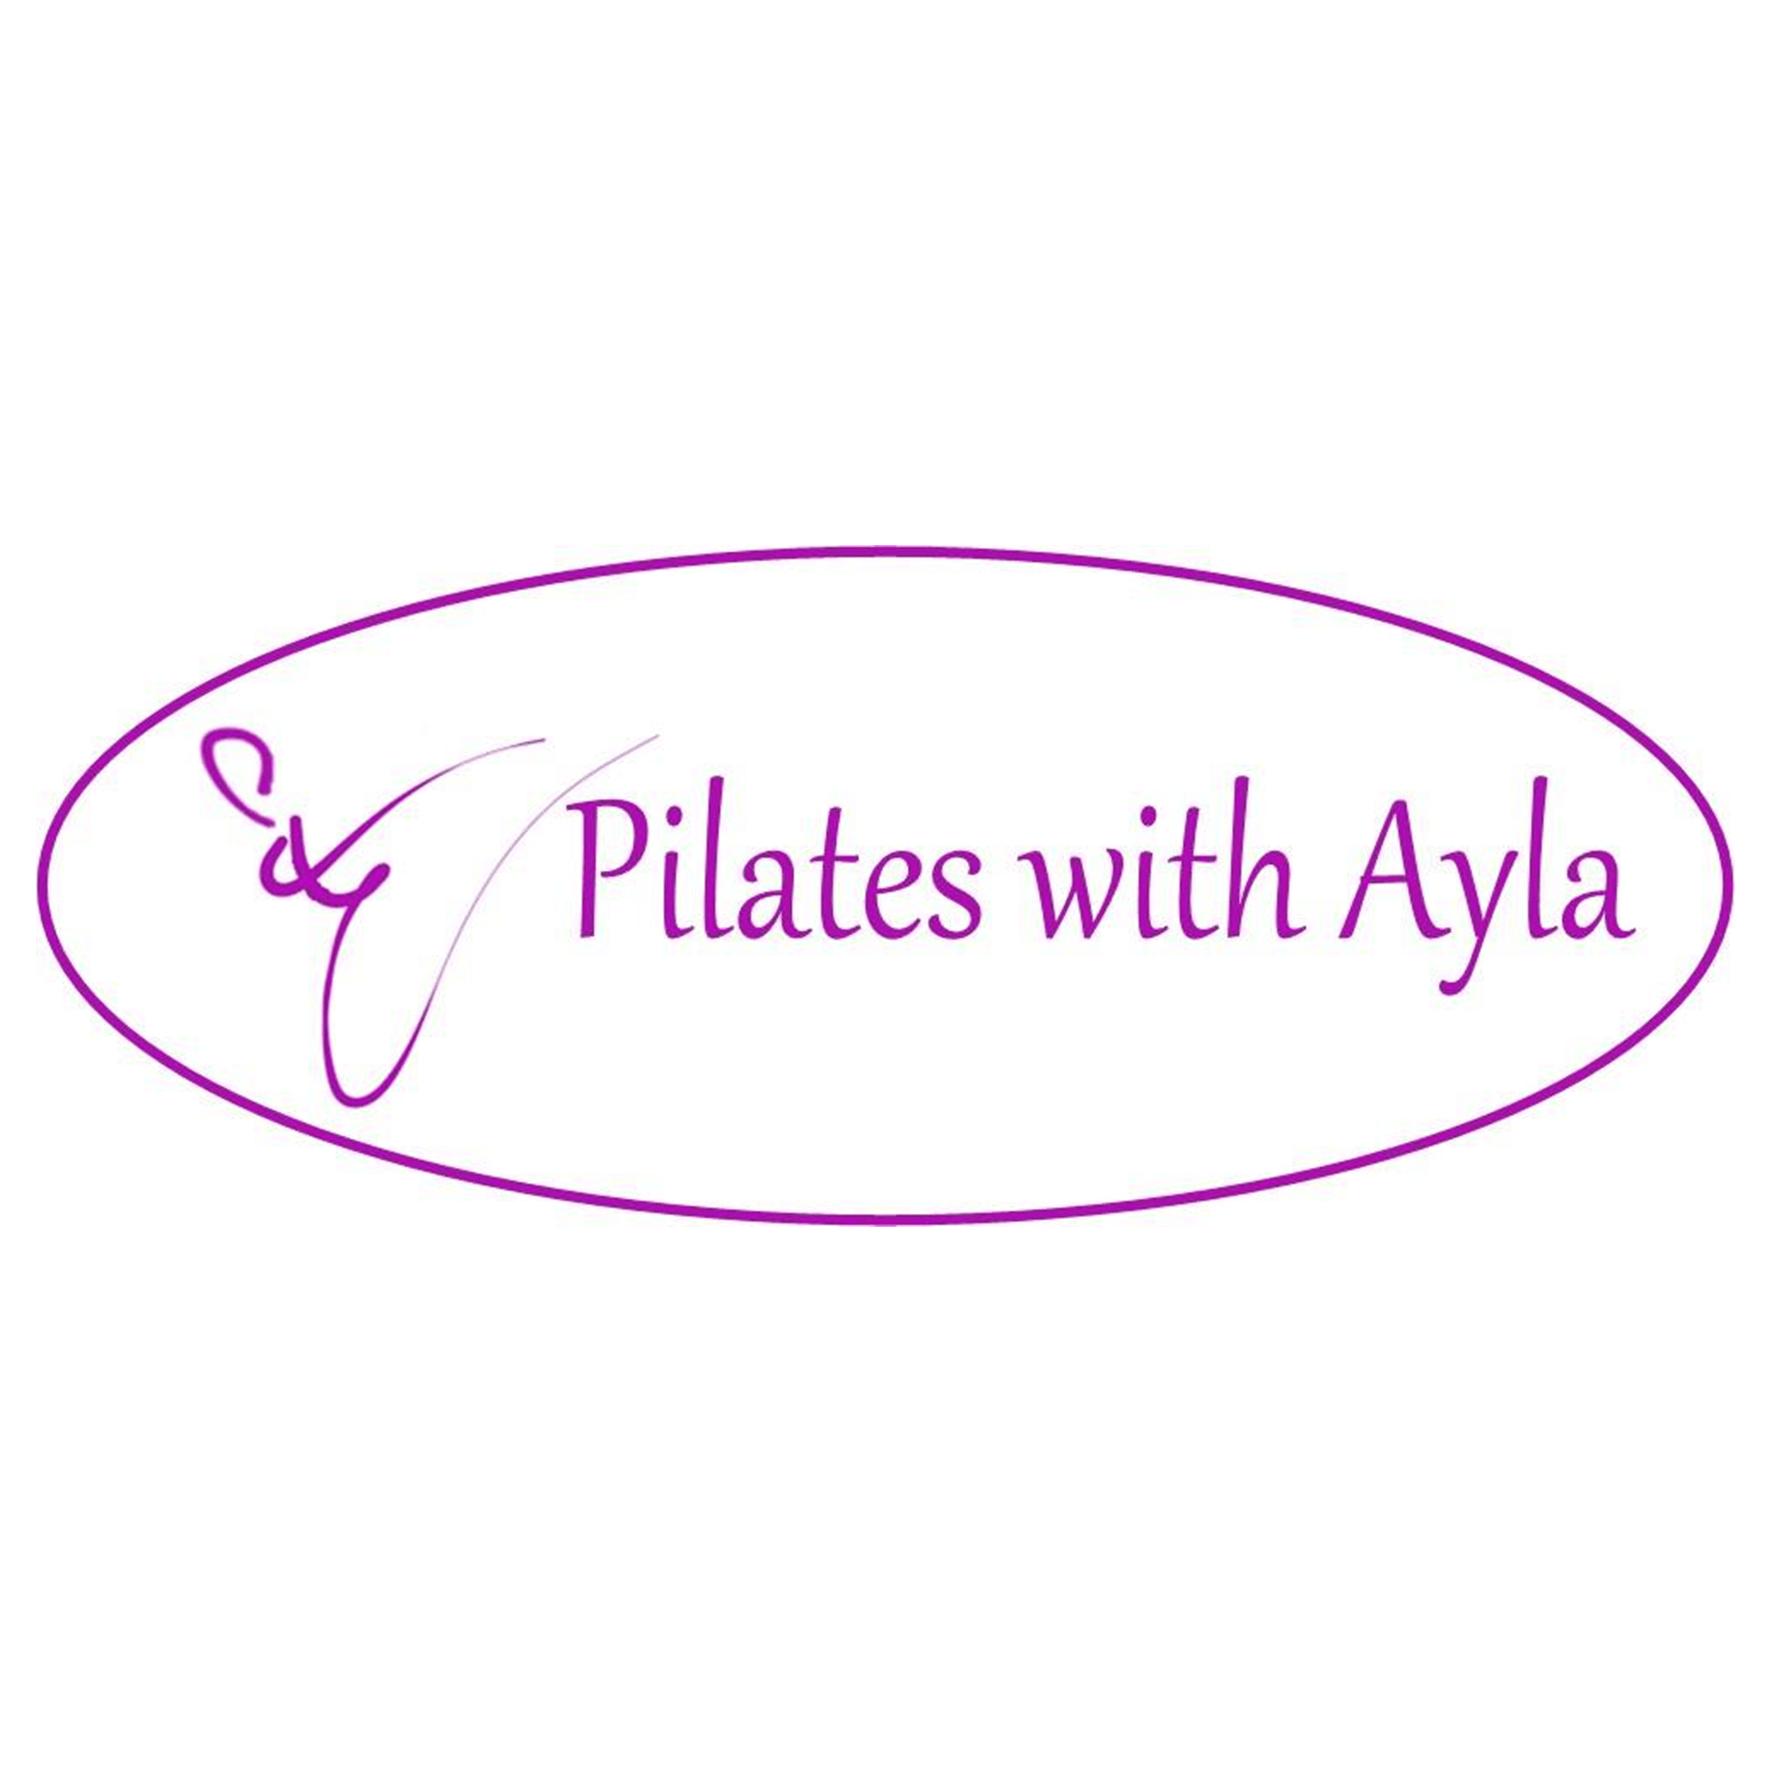 Pilates with Ayla